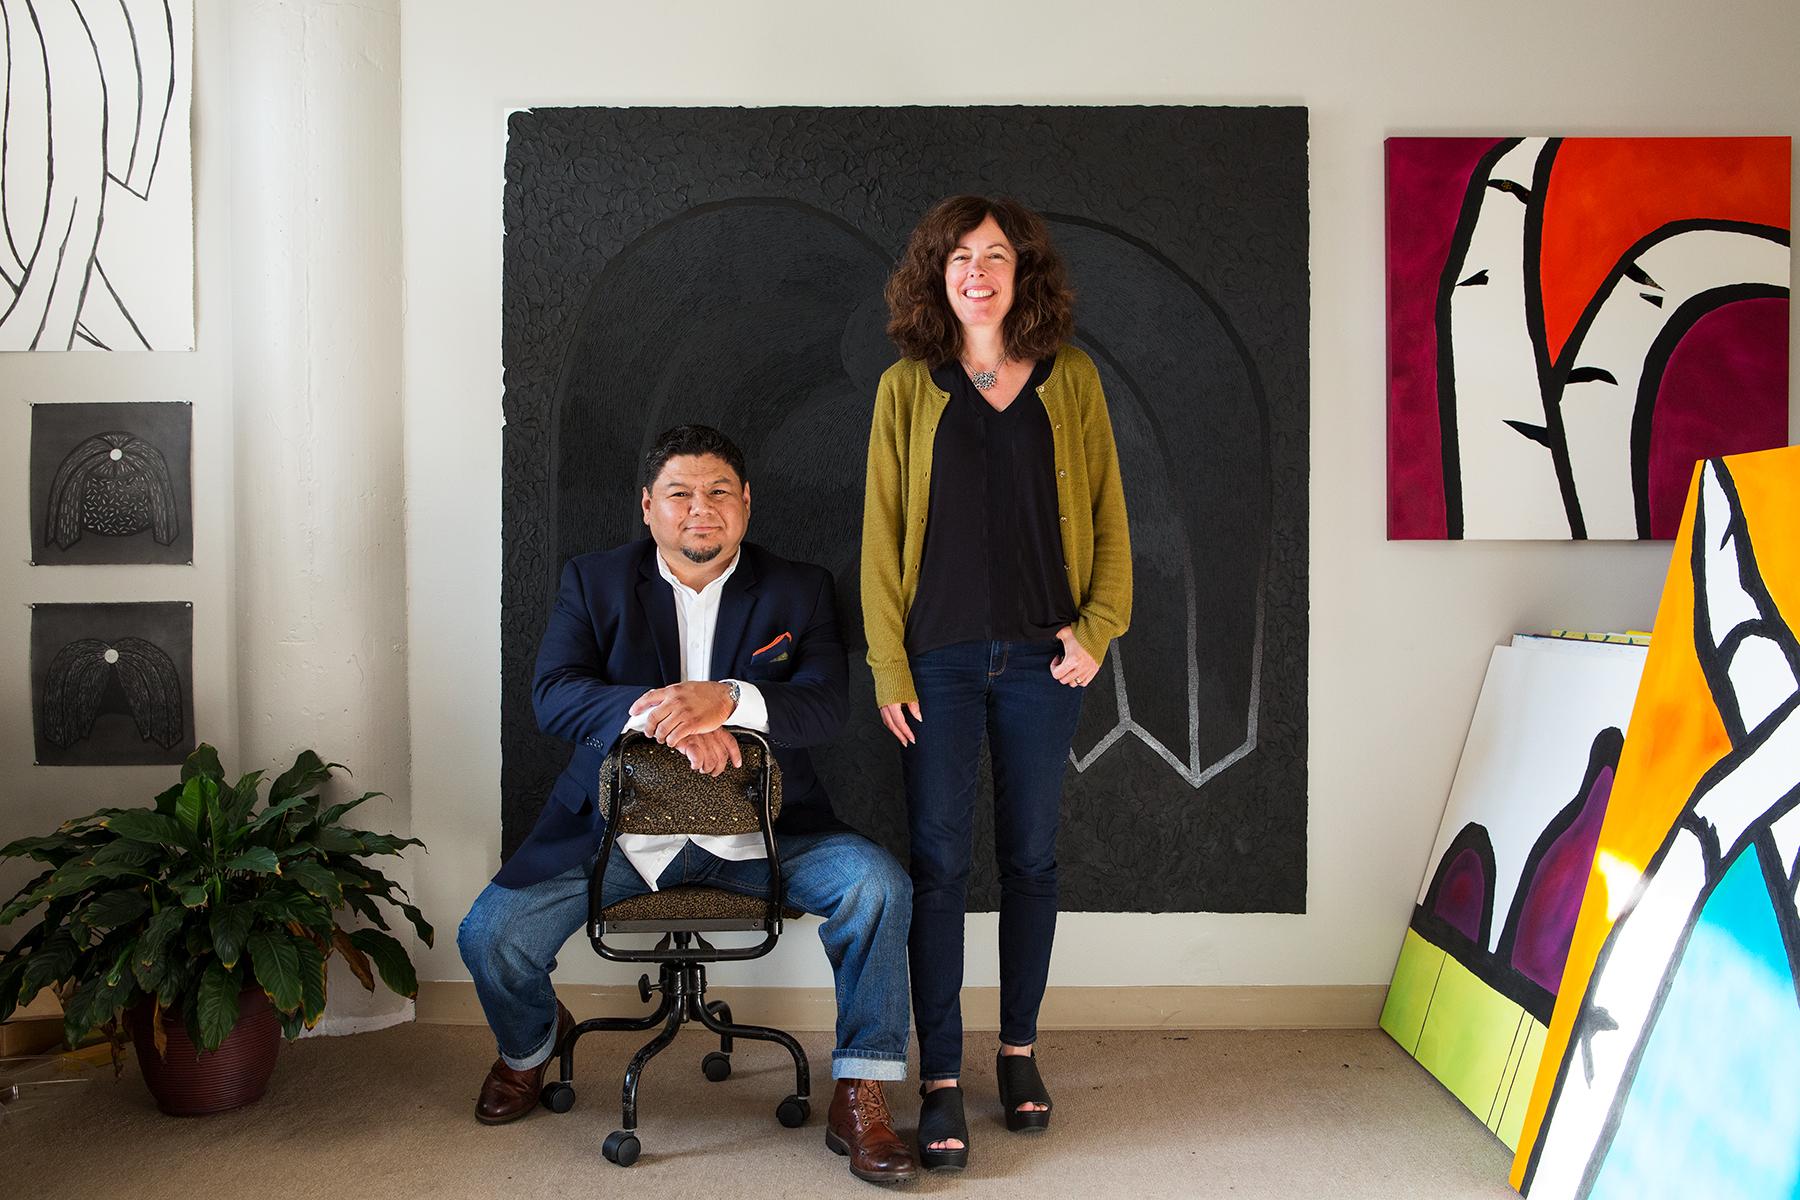 Co-curators, Frank Juarez & Melissa Dorn. Photo by Lois Bielefeld.